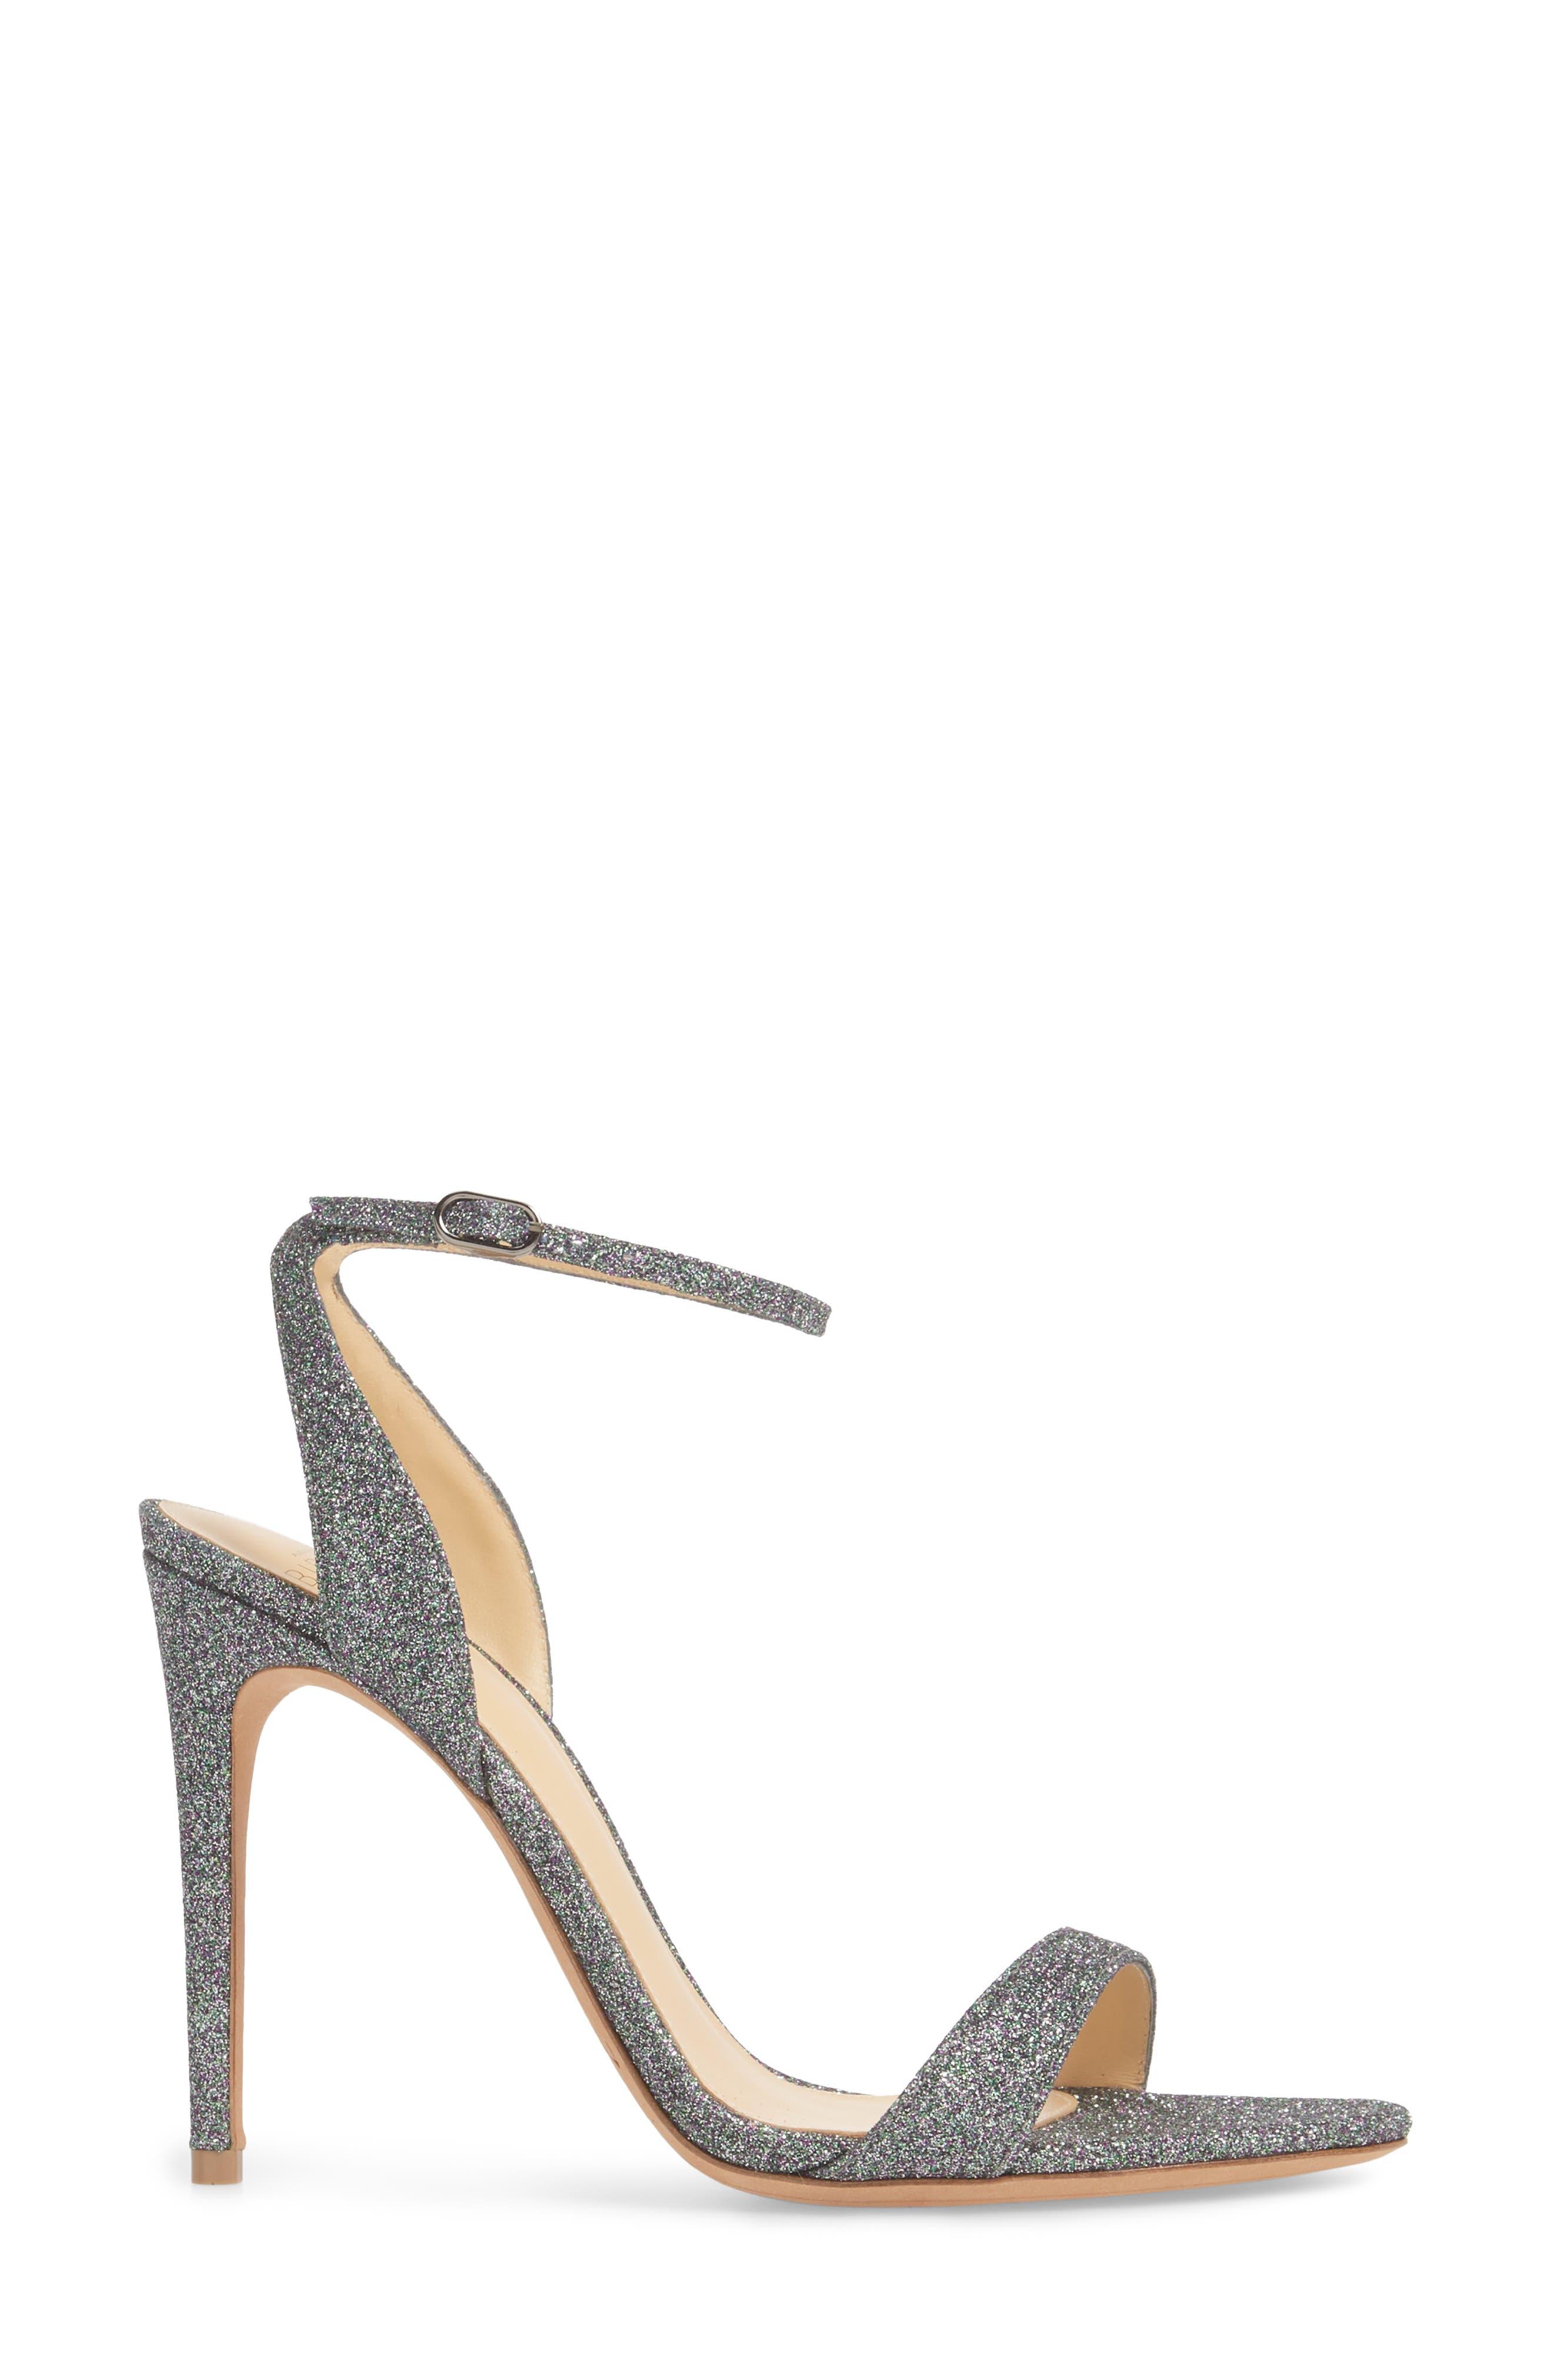 Santine Ankle Strap Sandal,                             Alternate thumbnail 3, color,                             040